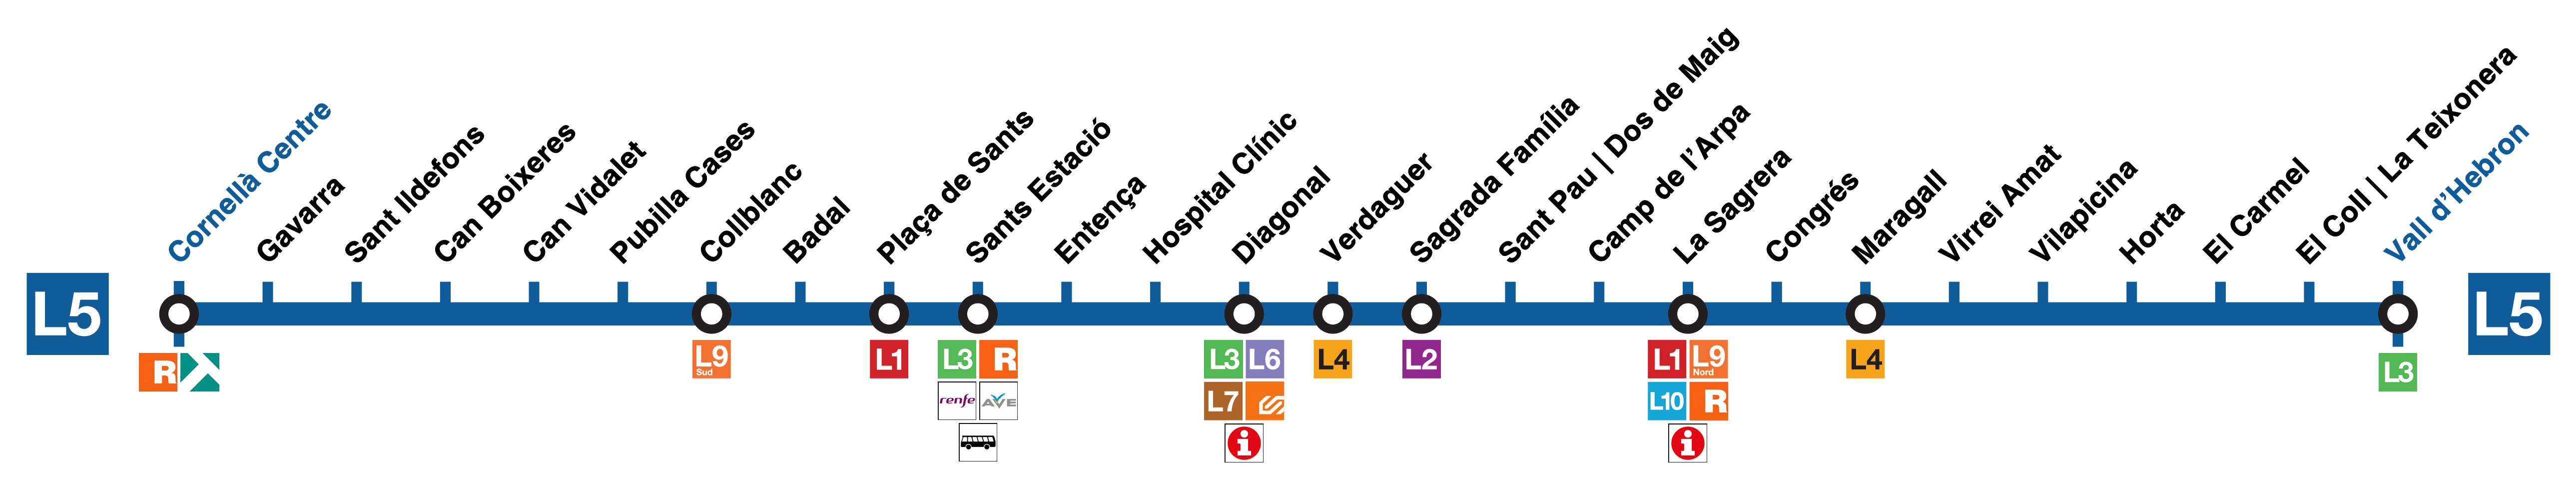 Lineas De Metro Barcelona Mapa.File Mapa Linea L5 Metro Barcelona Png Wikimedia Commons